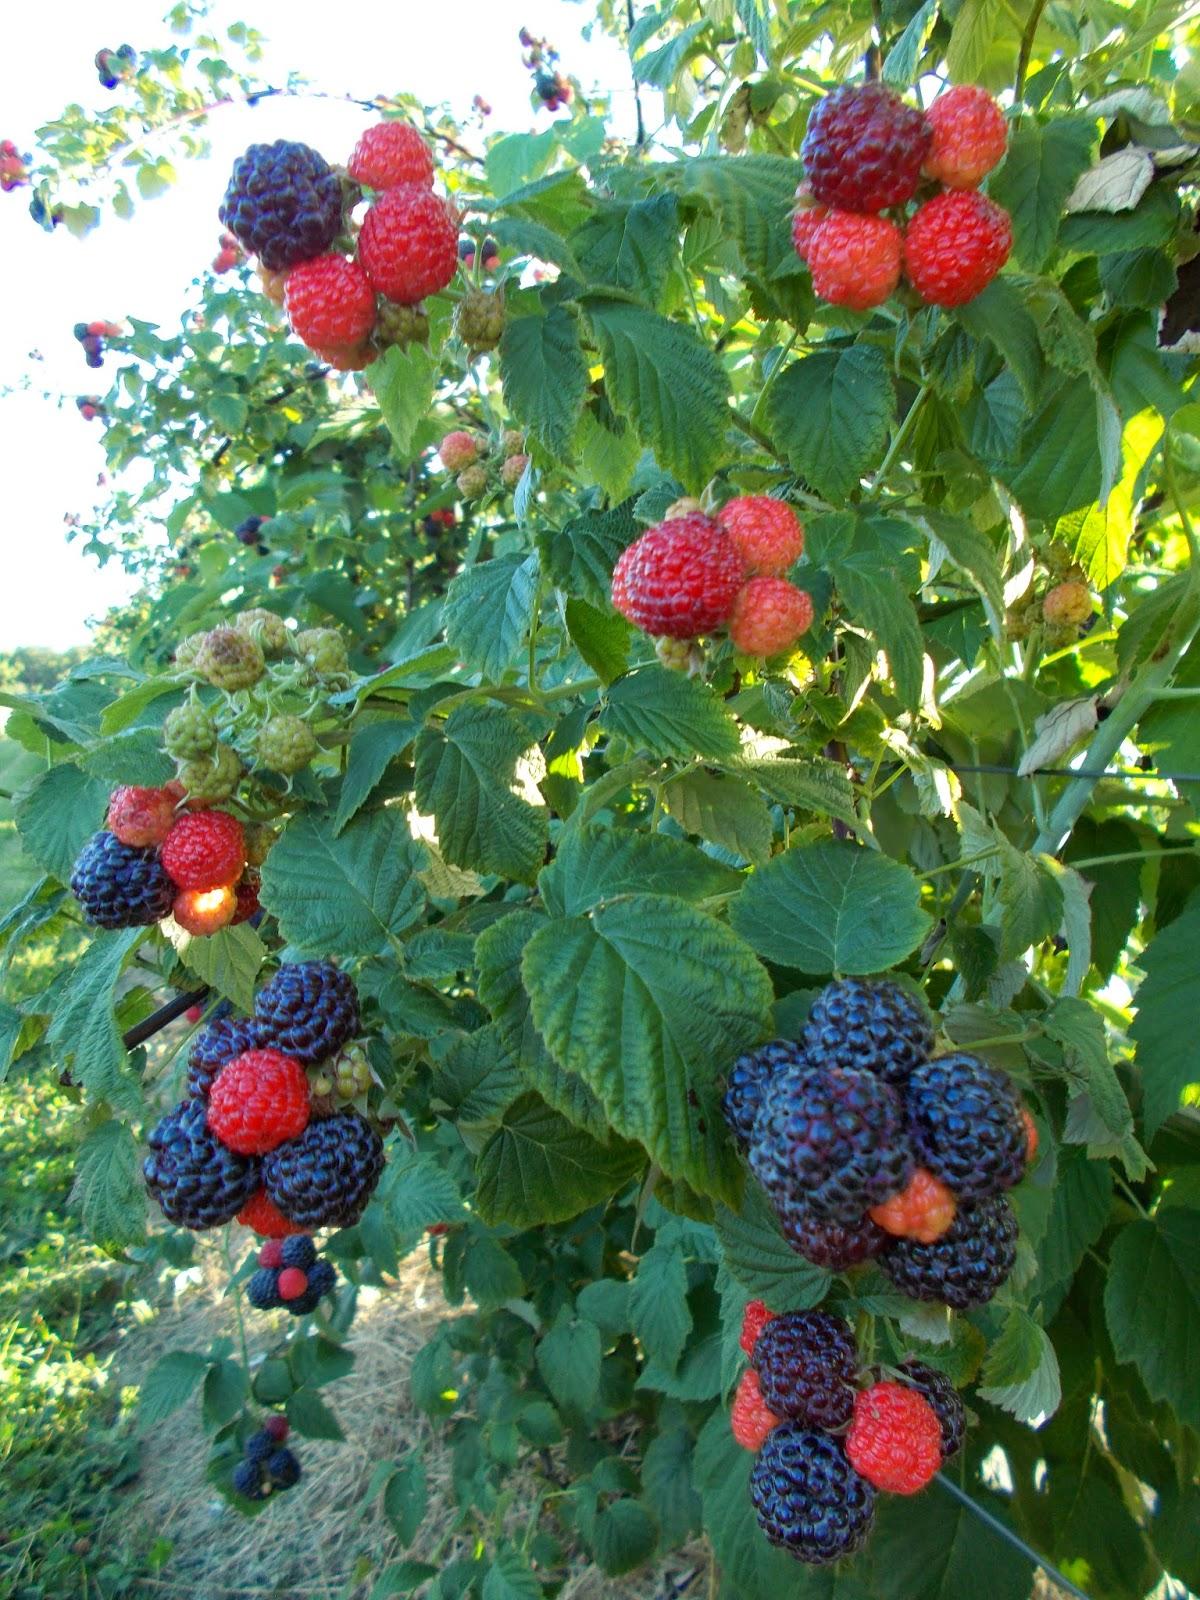 Blackberries in june essay help